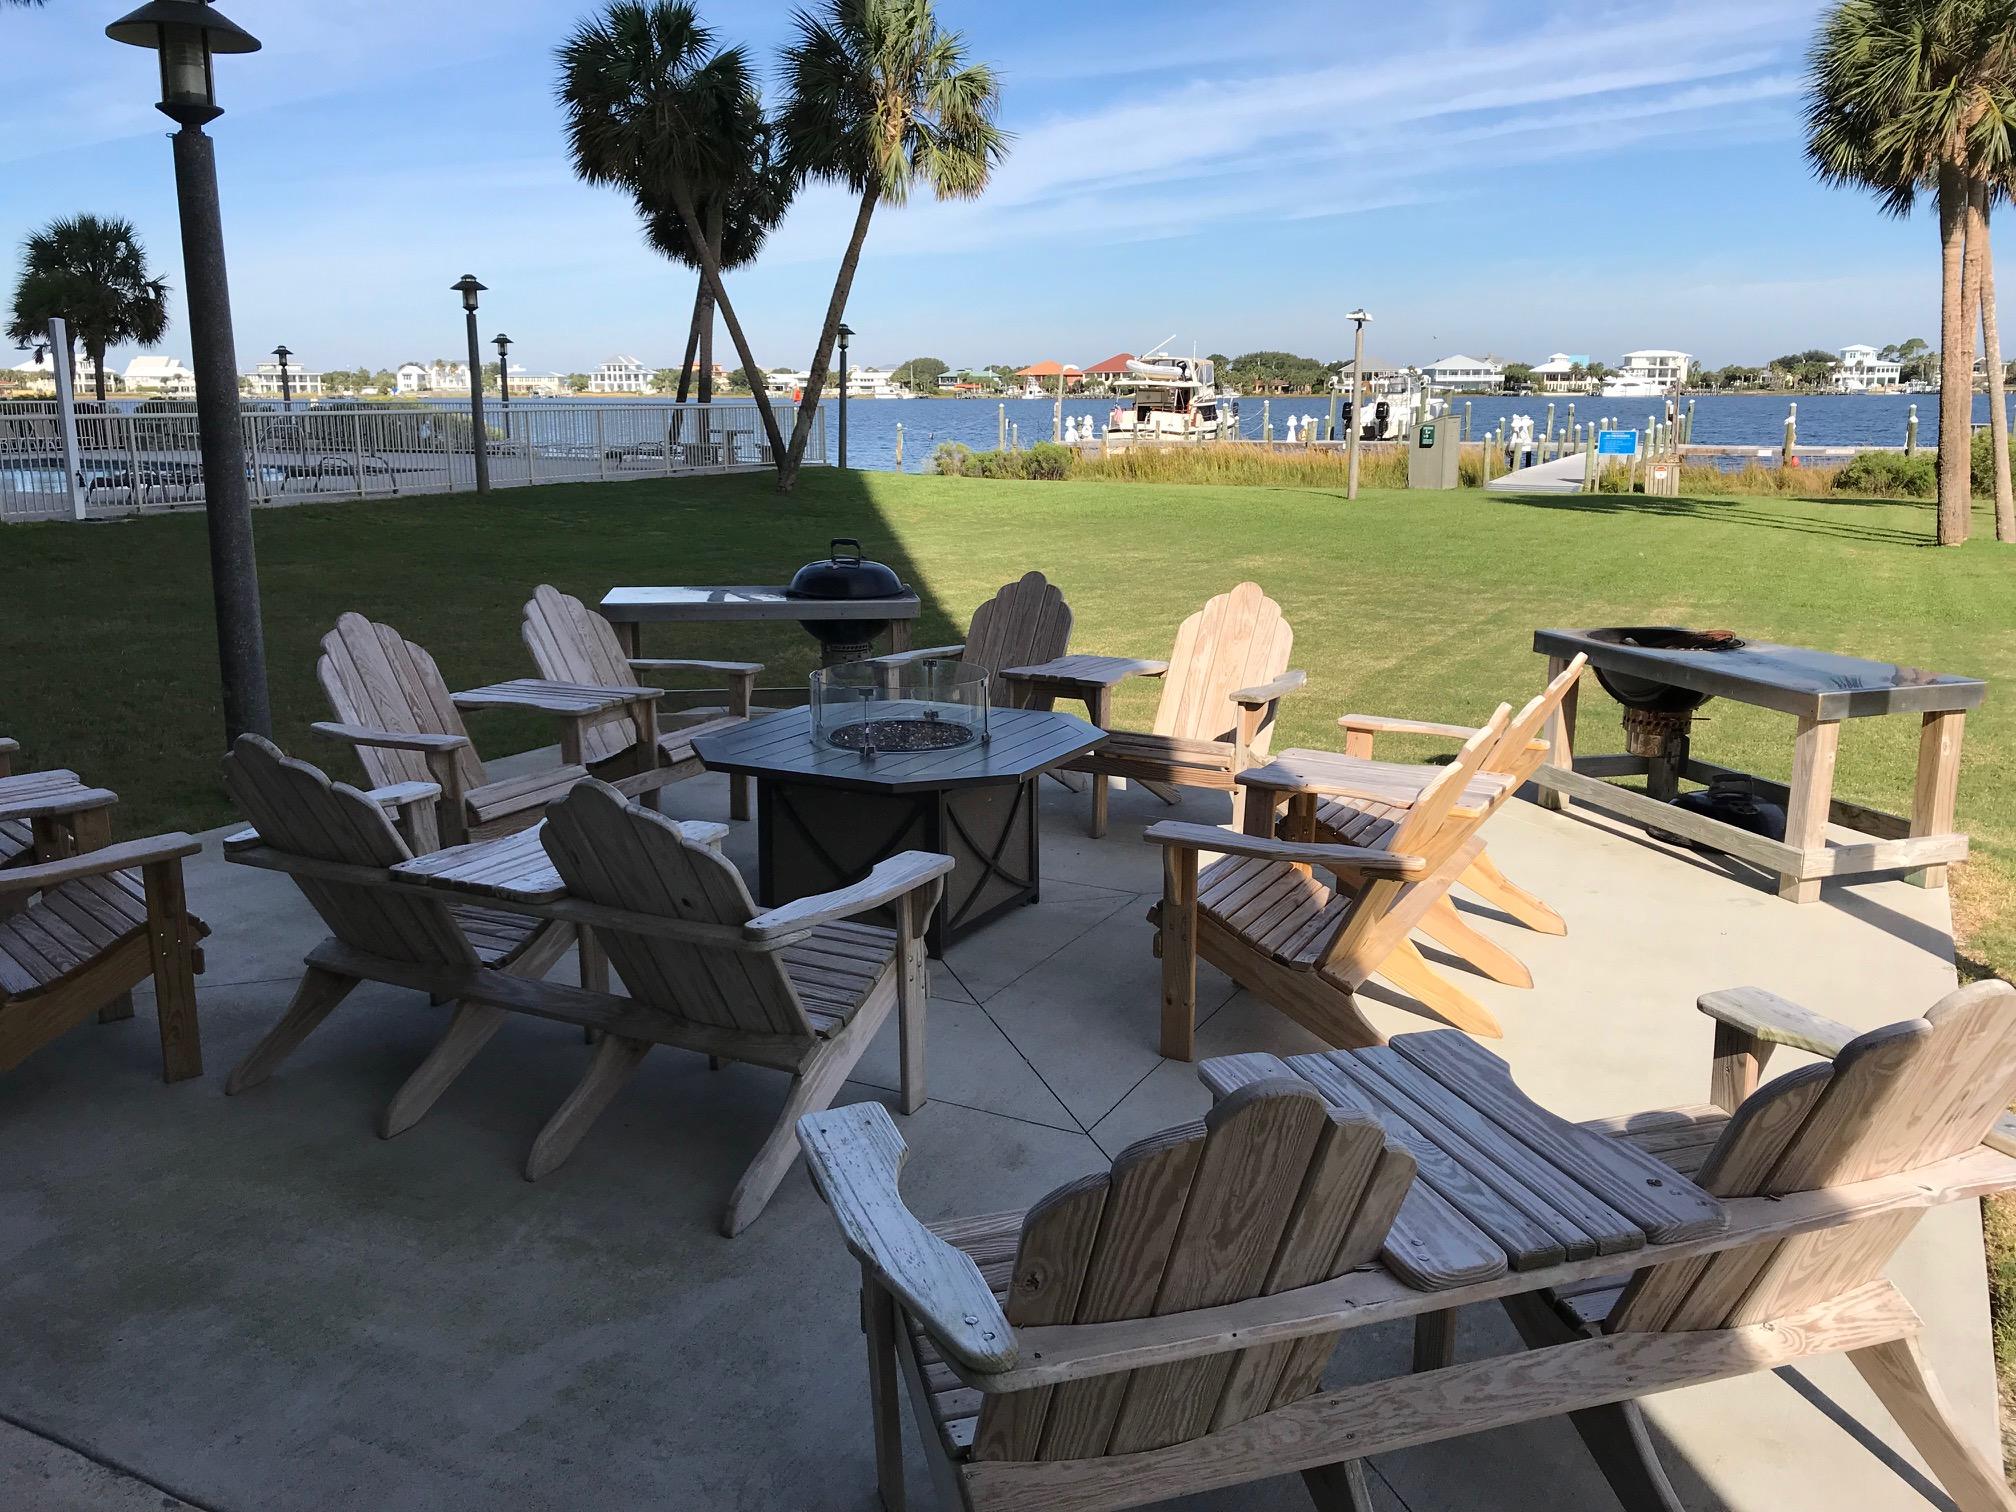 Sabine Yacht & Racquet Club #9D Condo rental in Sabine Yacht & Racquet Club ~ Pensacola Beach Condo Rentals by BeachGuide in Pensacola Beach Florida - #25